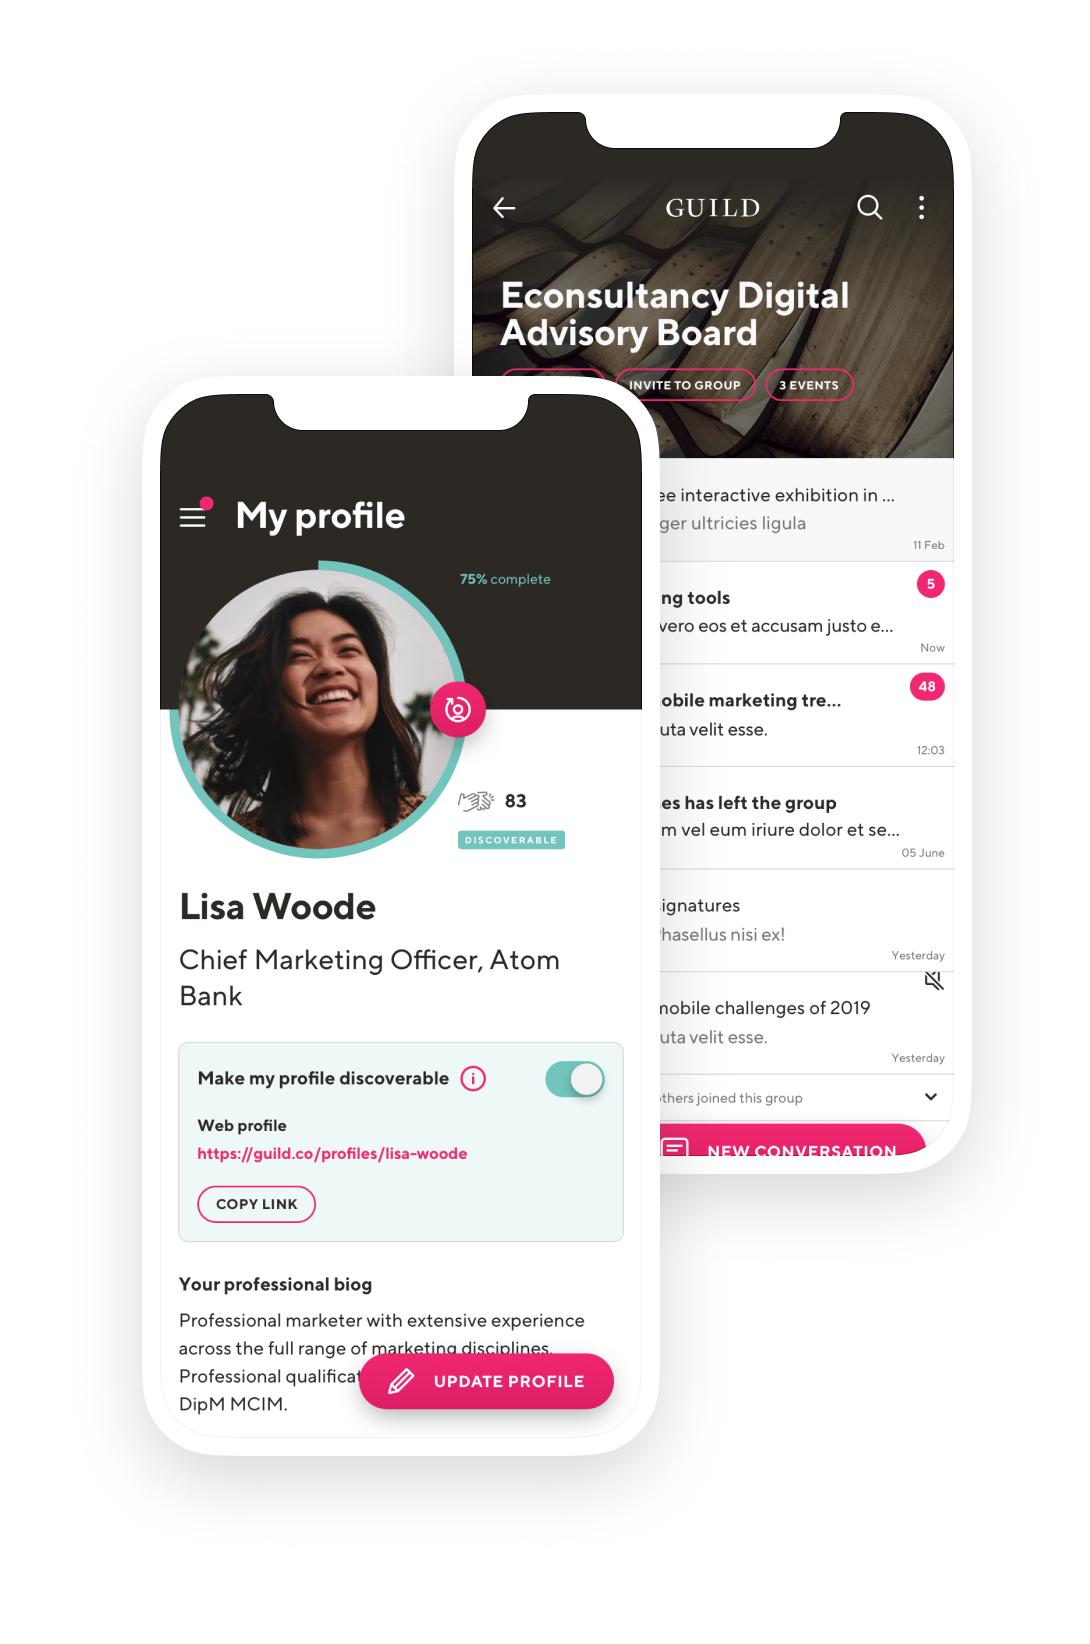 guild-mobile-app-mockup